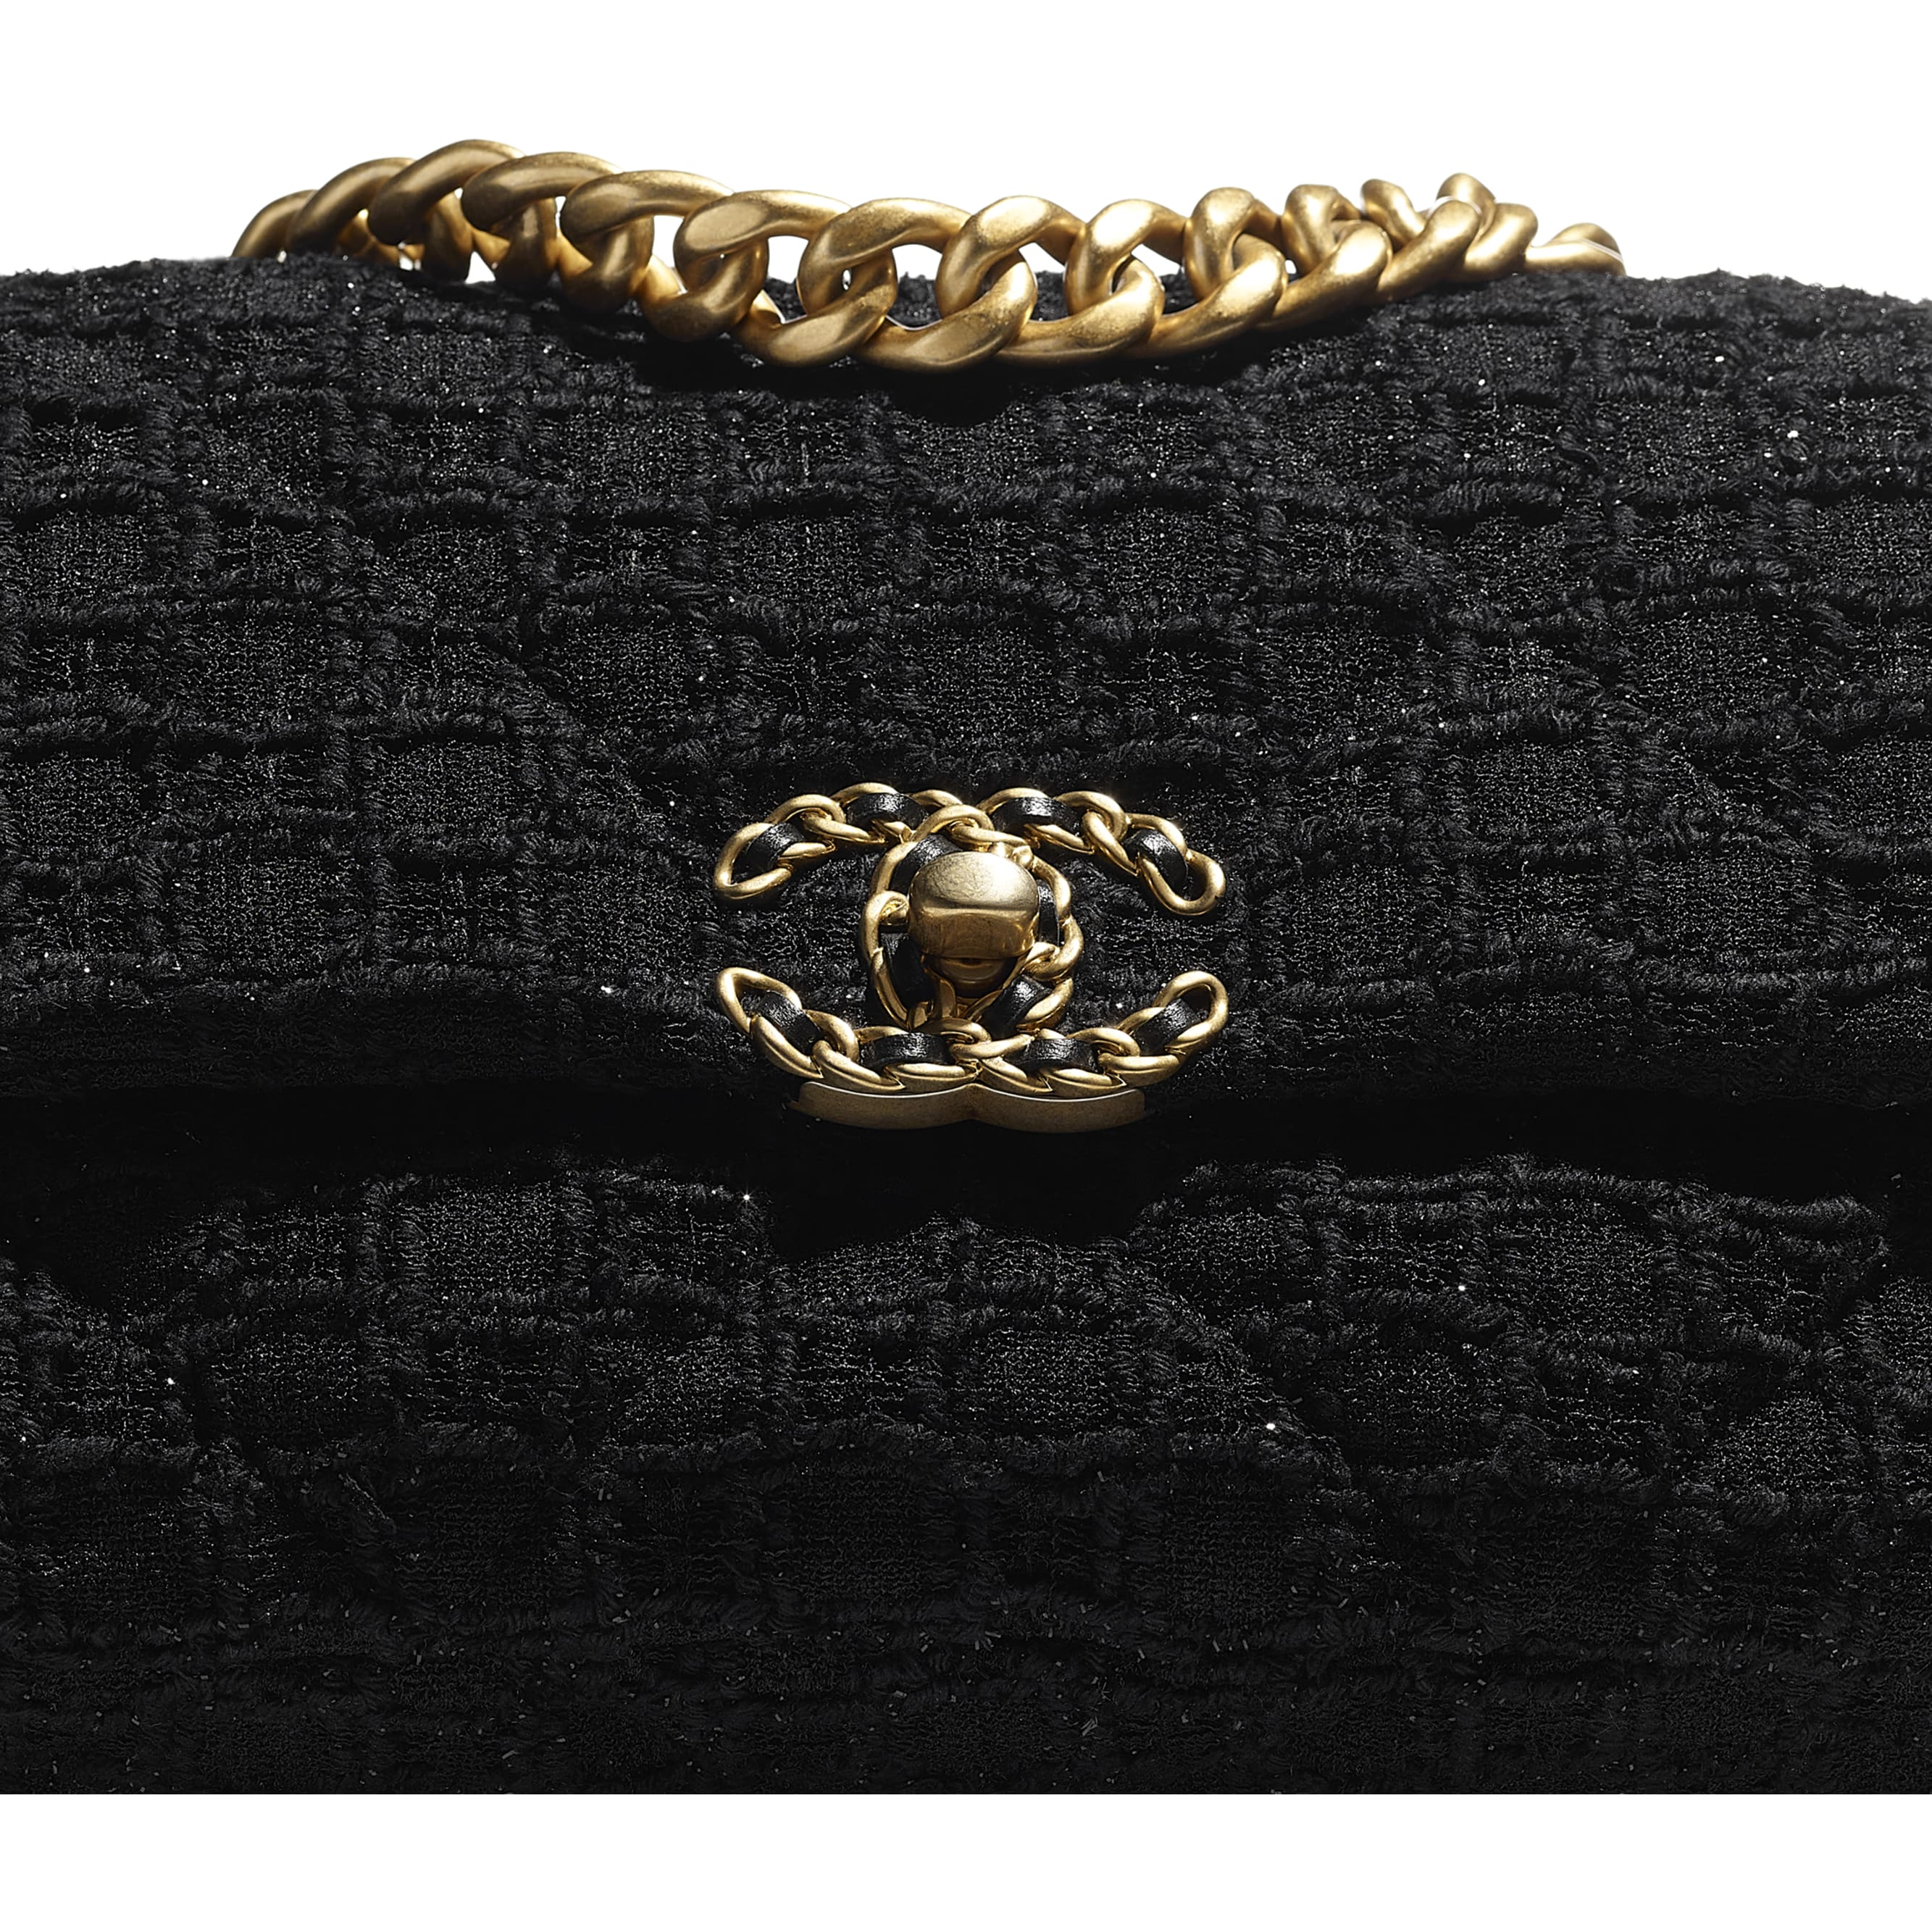 CHANEL 19 Handbag - Black - Tweed, Gold-Tone, Silver-Tone & Ruthenium-Finish Metal - CHANEL - Extra view - see standard sized version